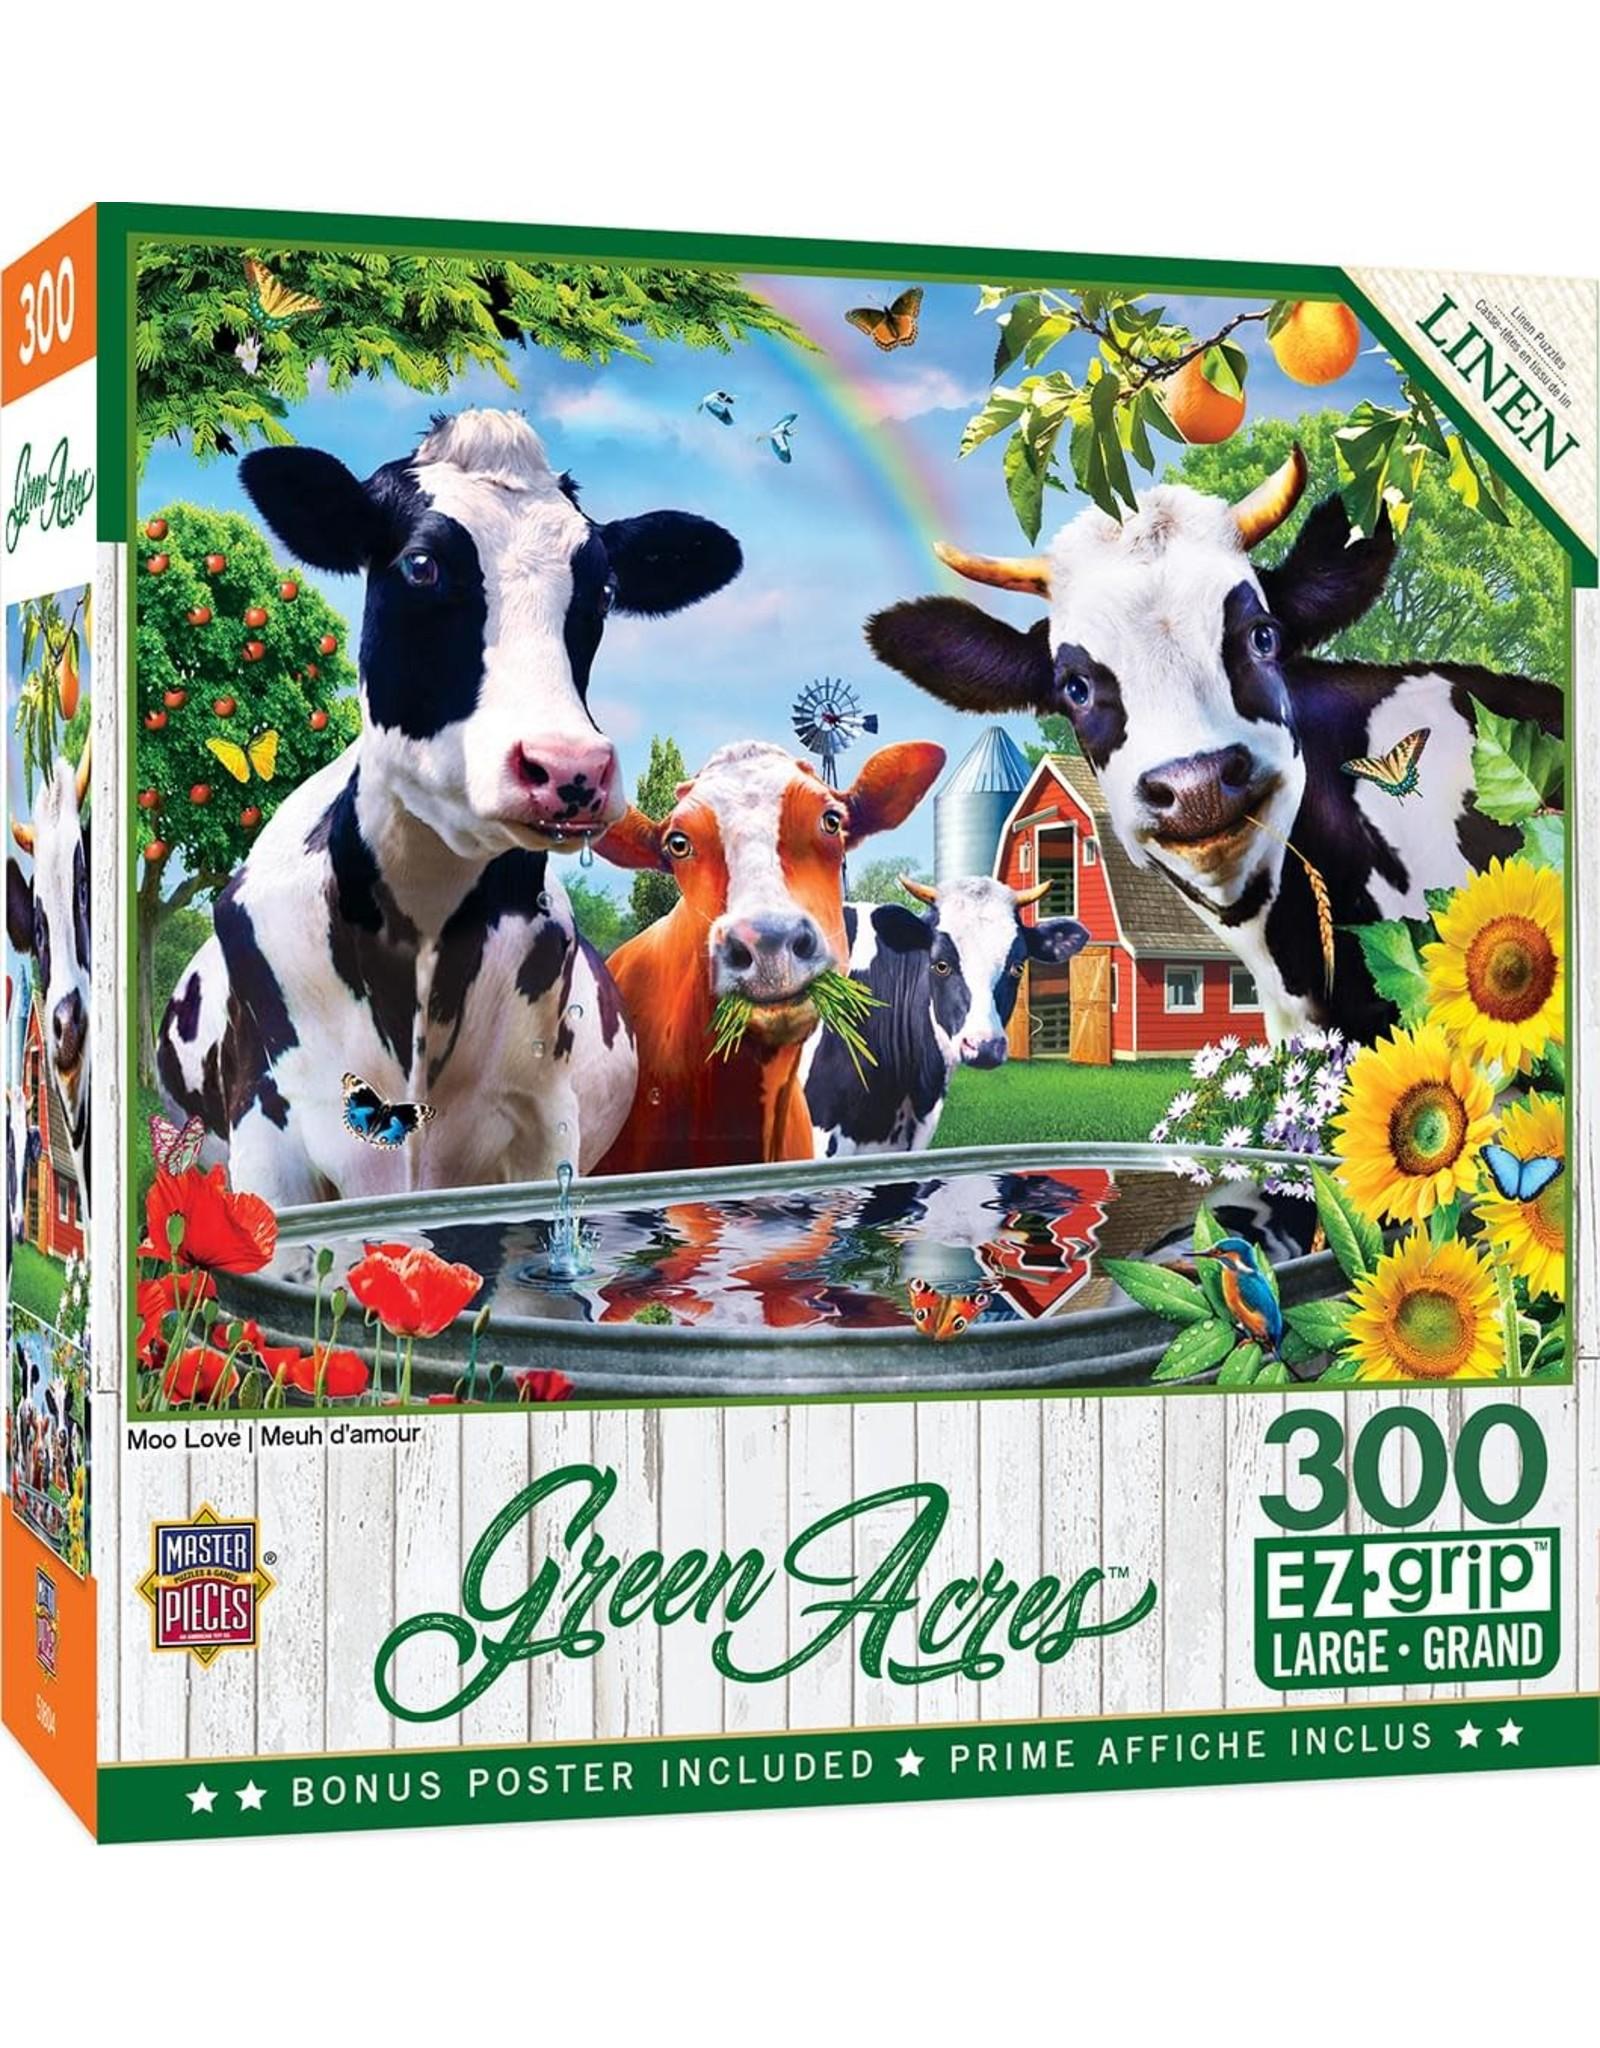 Master Pieces Green Acres - Moo Love 300pc EzGrip Puzzle